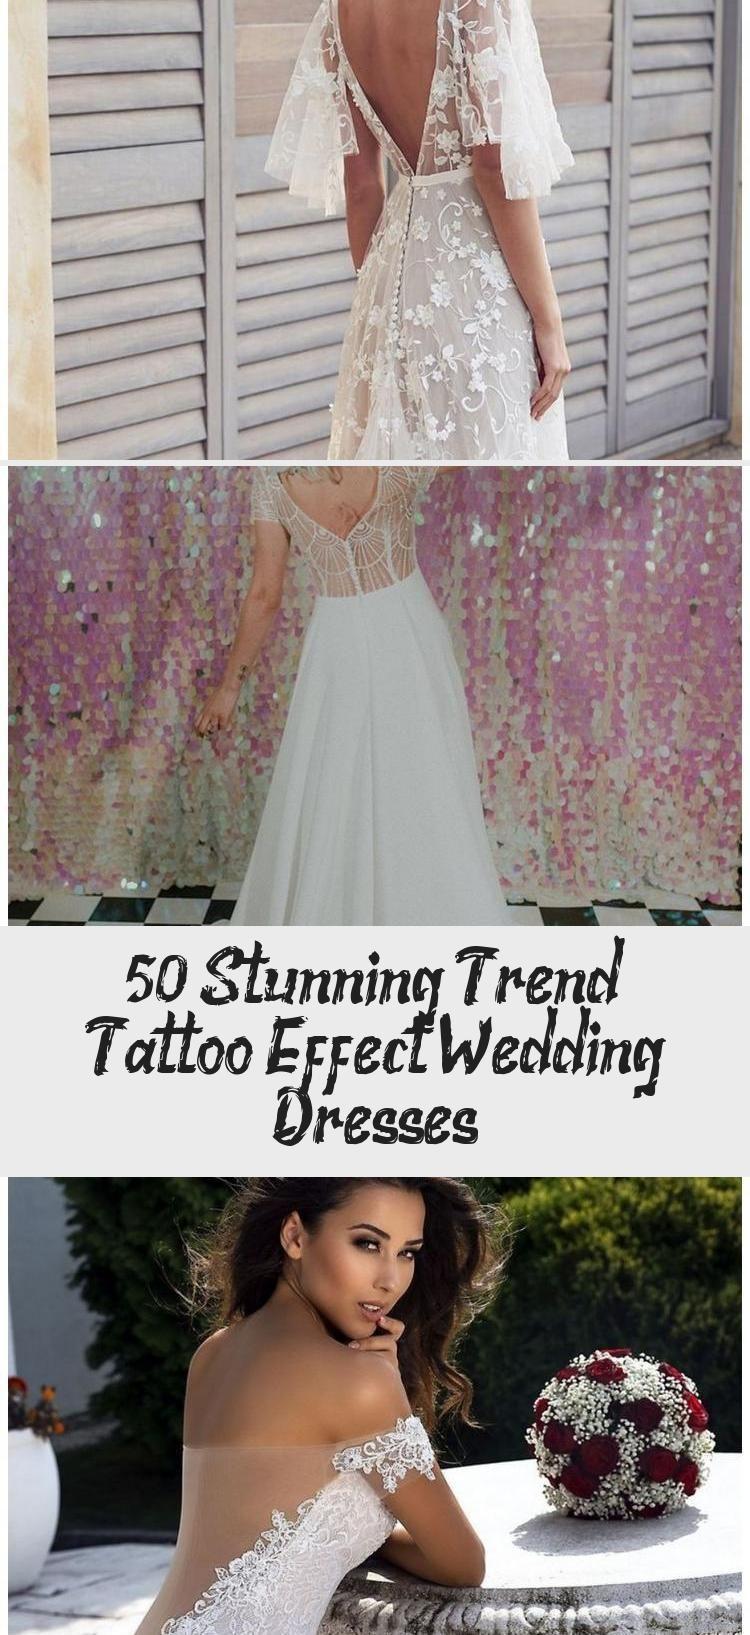 50+ Stunning Trend Tattoo Effect Wedding Dresses in 2020